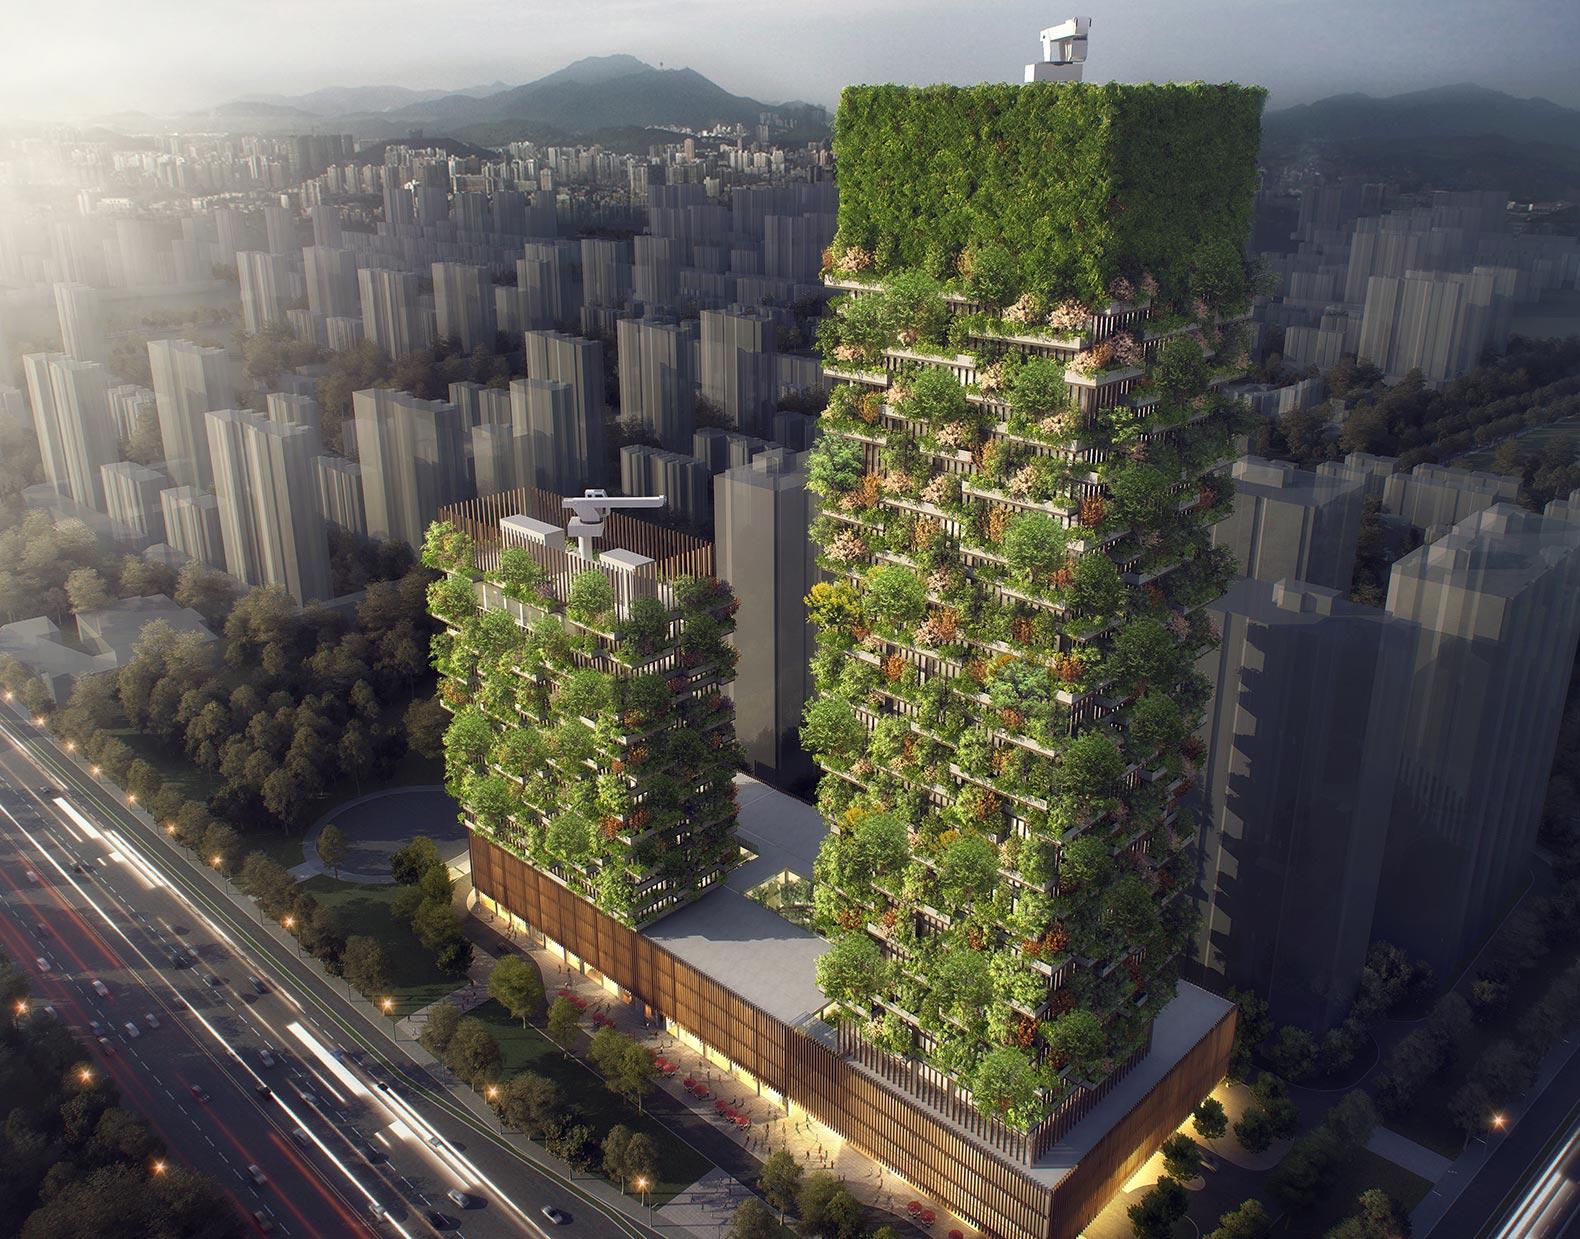 nanjing-towers-two-green-buildings